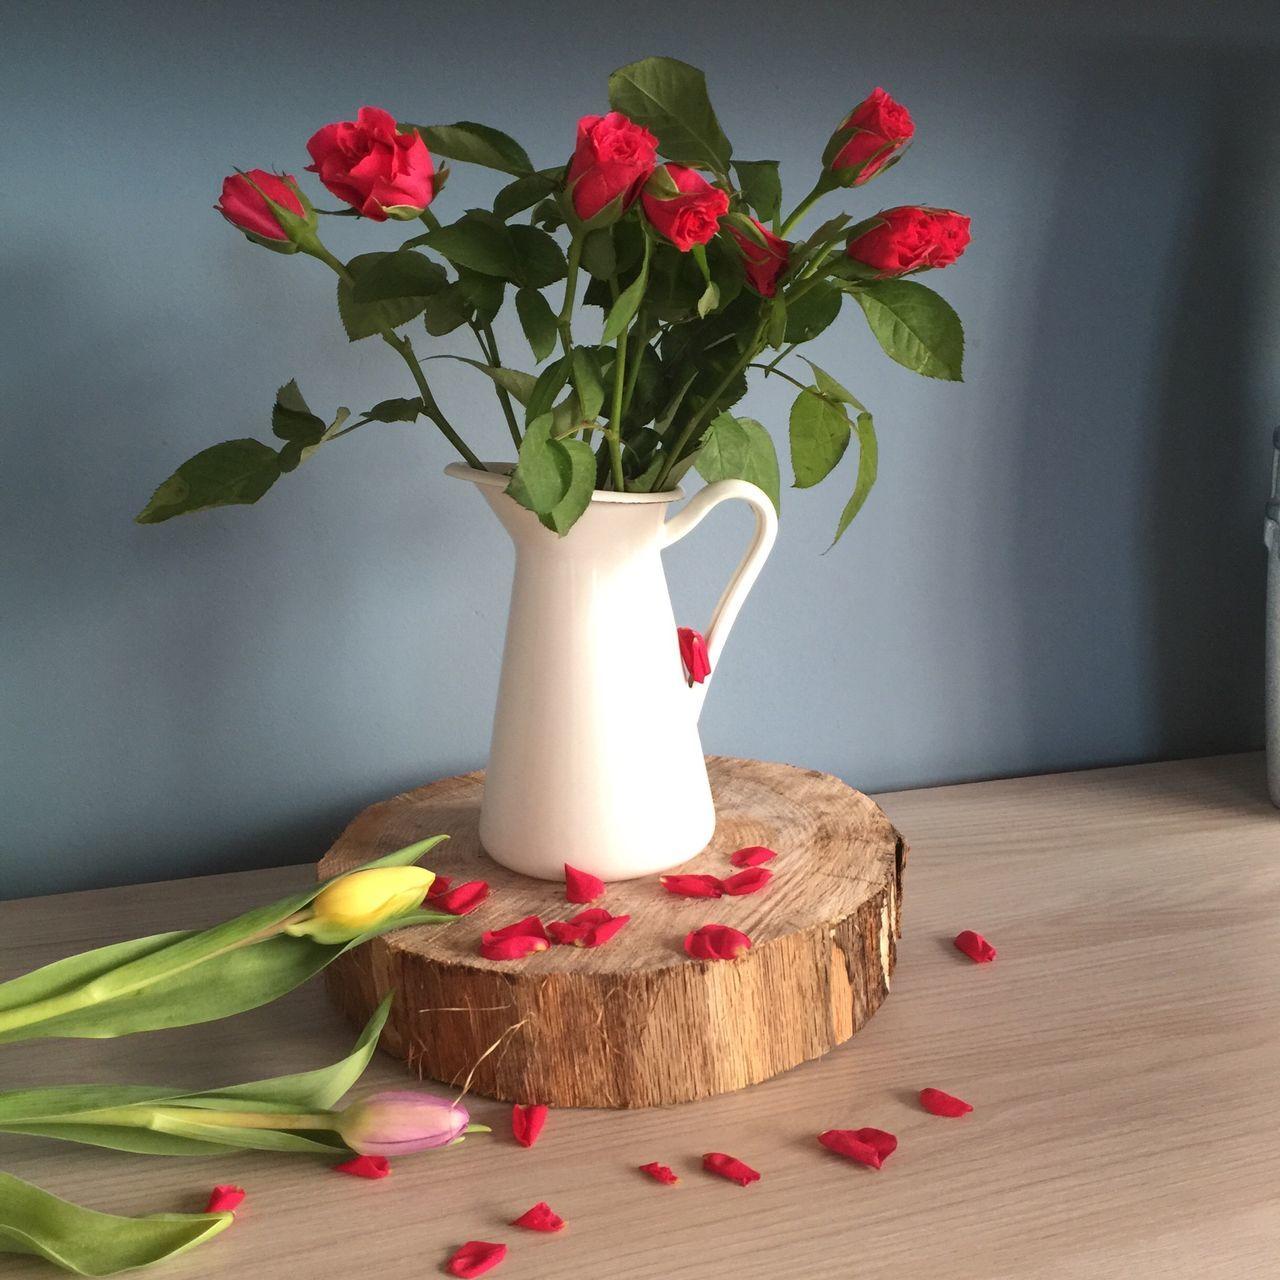 flower, indoors, vase, table, petal, freshness, home interior, decoration, fragility, red, wall - building feature, flower arrangement, flower head, rose - flower, leaf, potted plant, pink color, plant, flower pot, still life